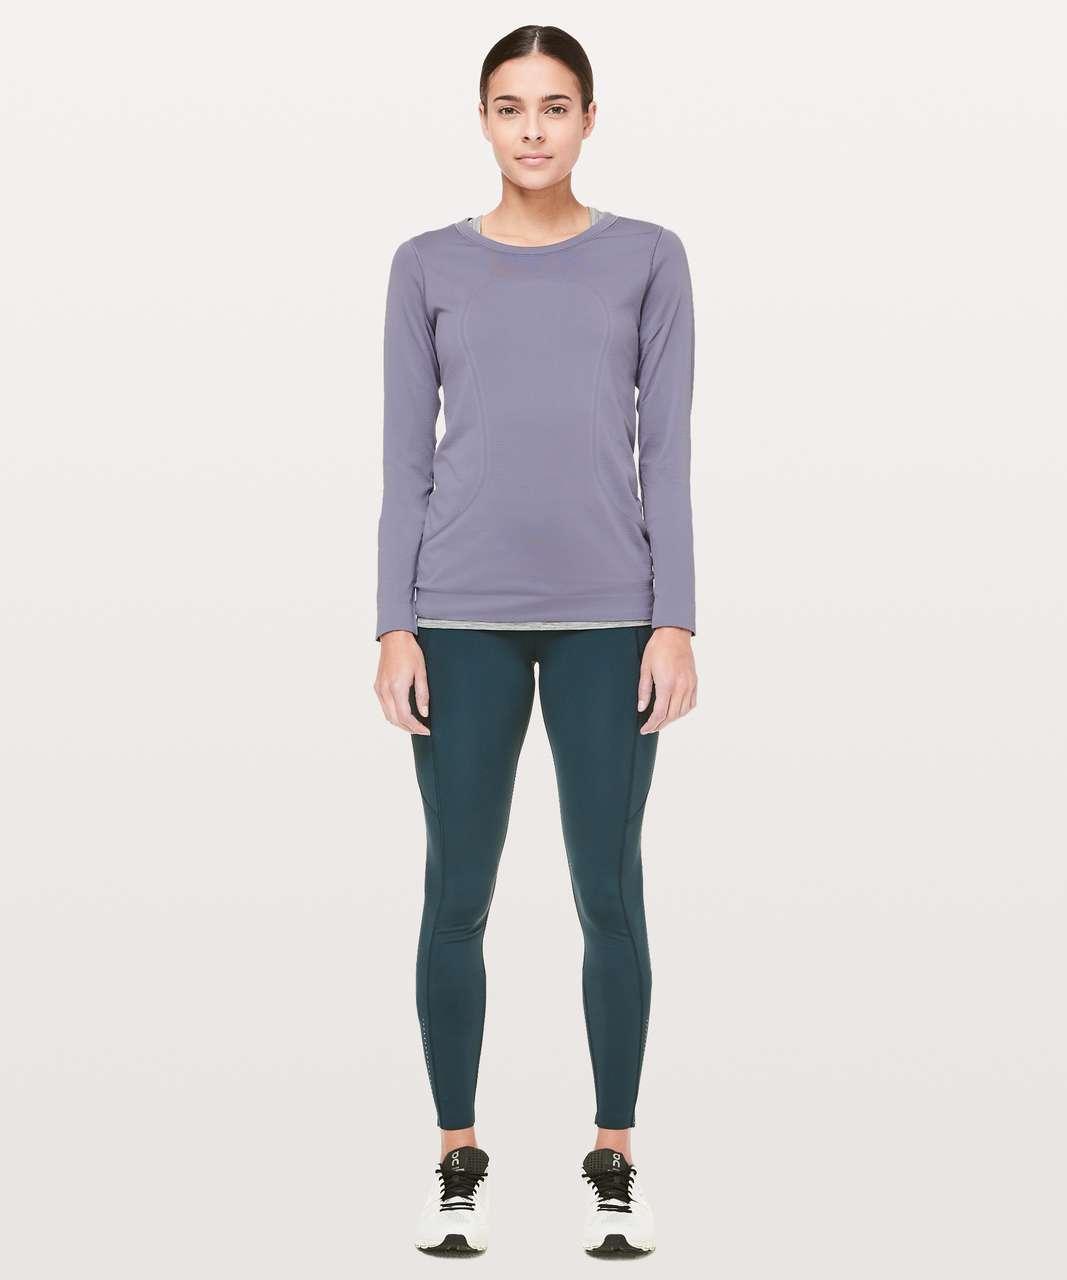 Lululemon Swiftly Tech Long Sleeve (Breeze) *Relaxed Fit - Purple Quartz / Purple Quartz